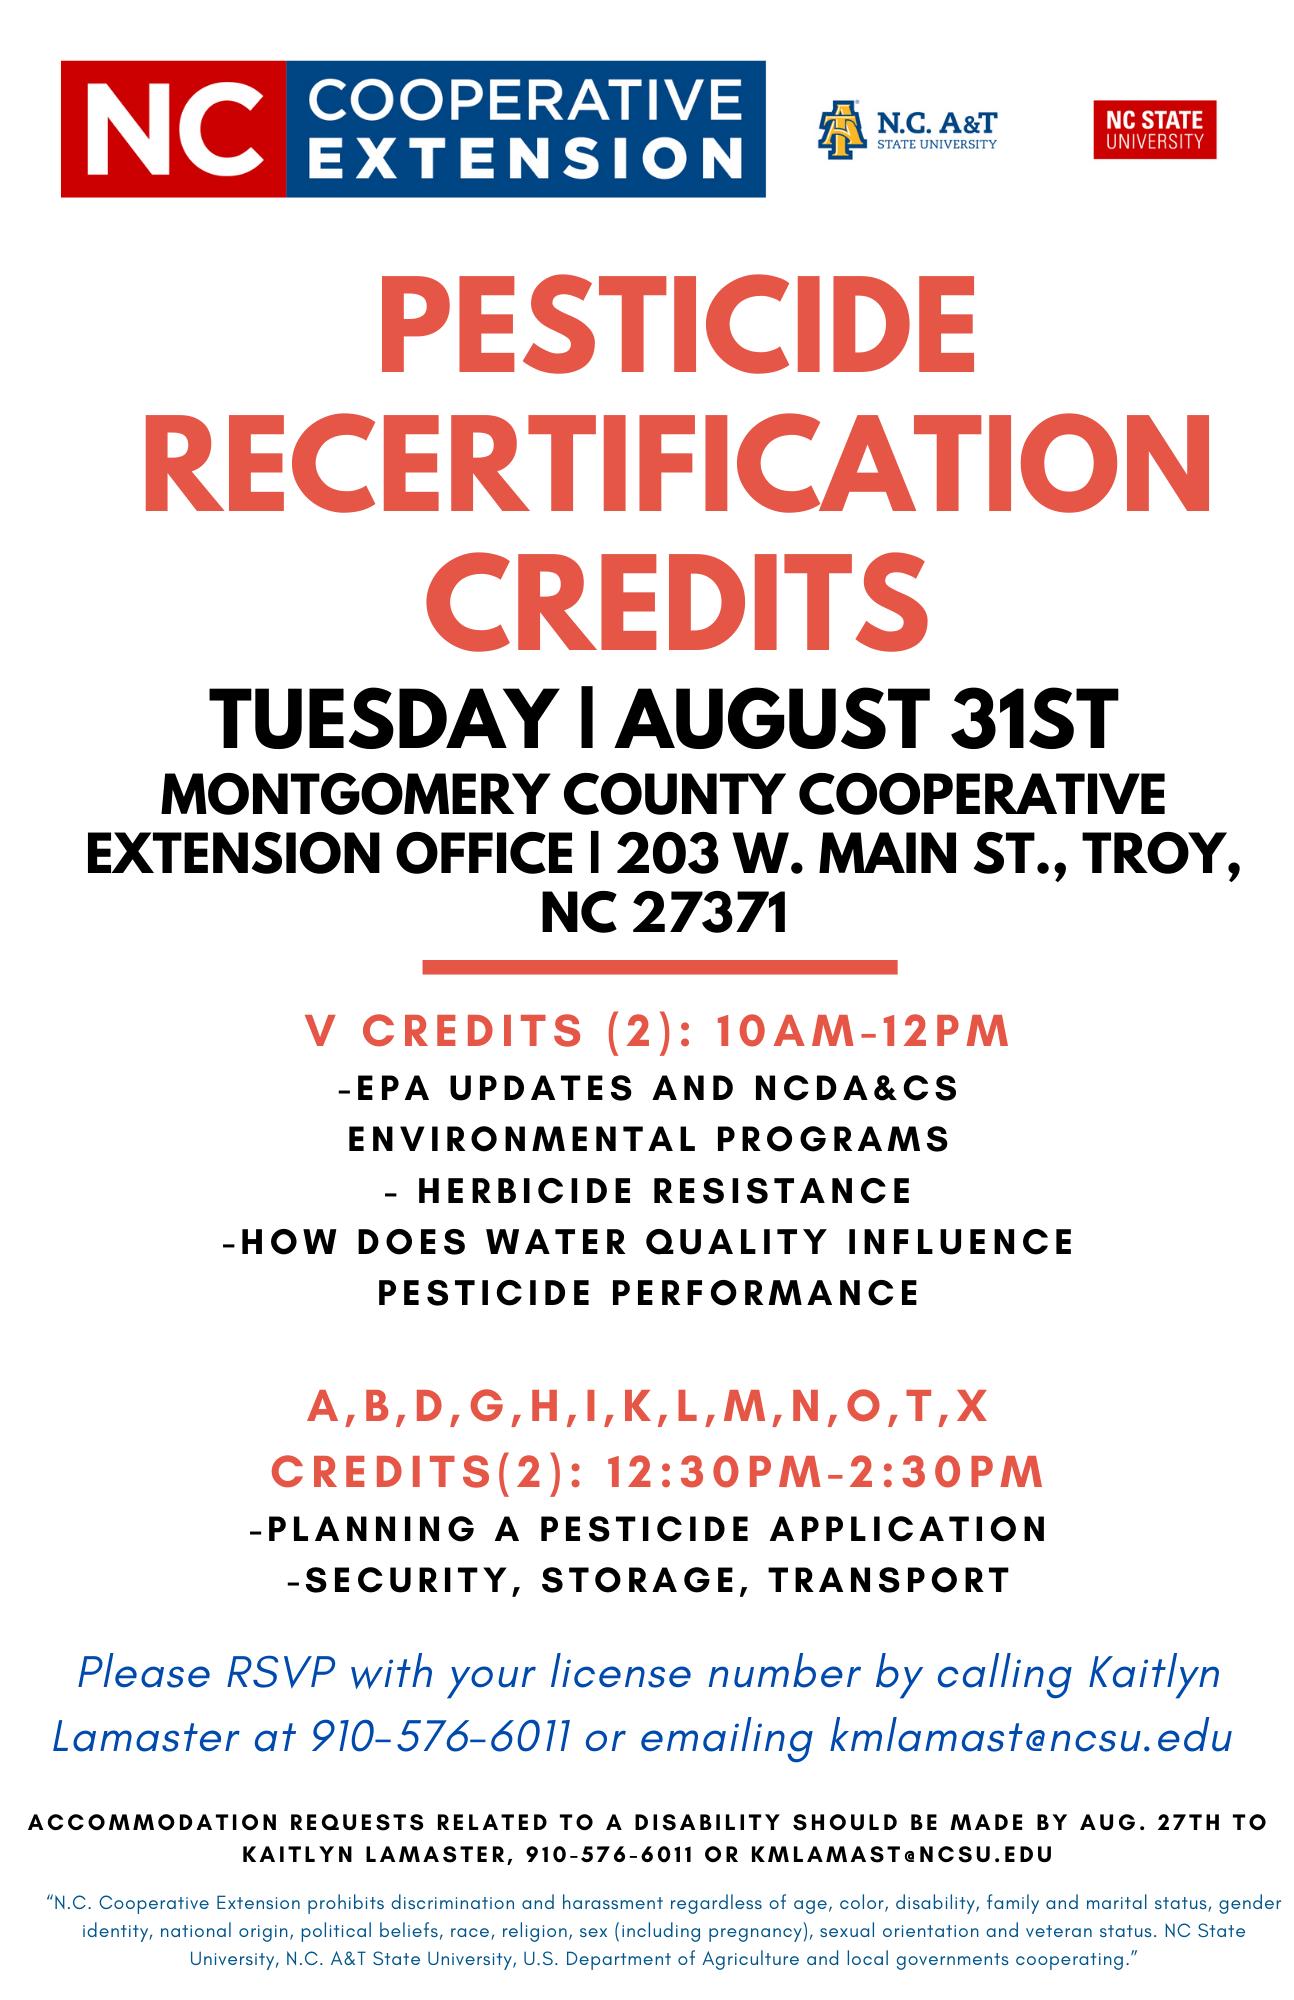 Pesticide Recertification Credits flyer